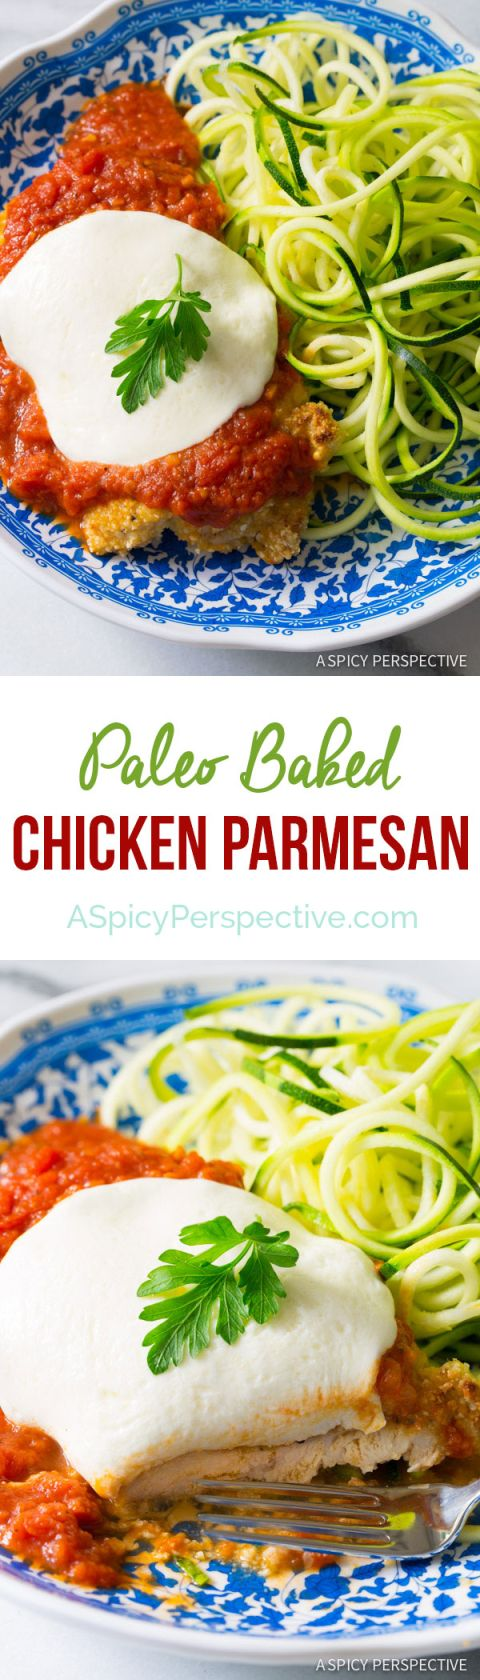 Amazing Paleo Baked Chicken Parmesan on ASpicyPerspective.com #paleo #primal